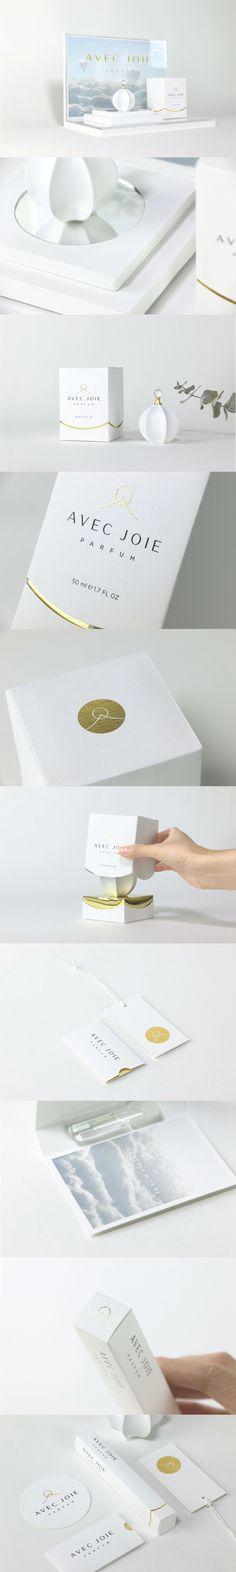 AVEC JOIE Fragrance Packaging designed by Yuga Huang